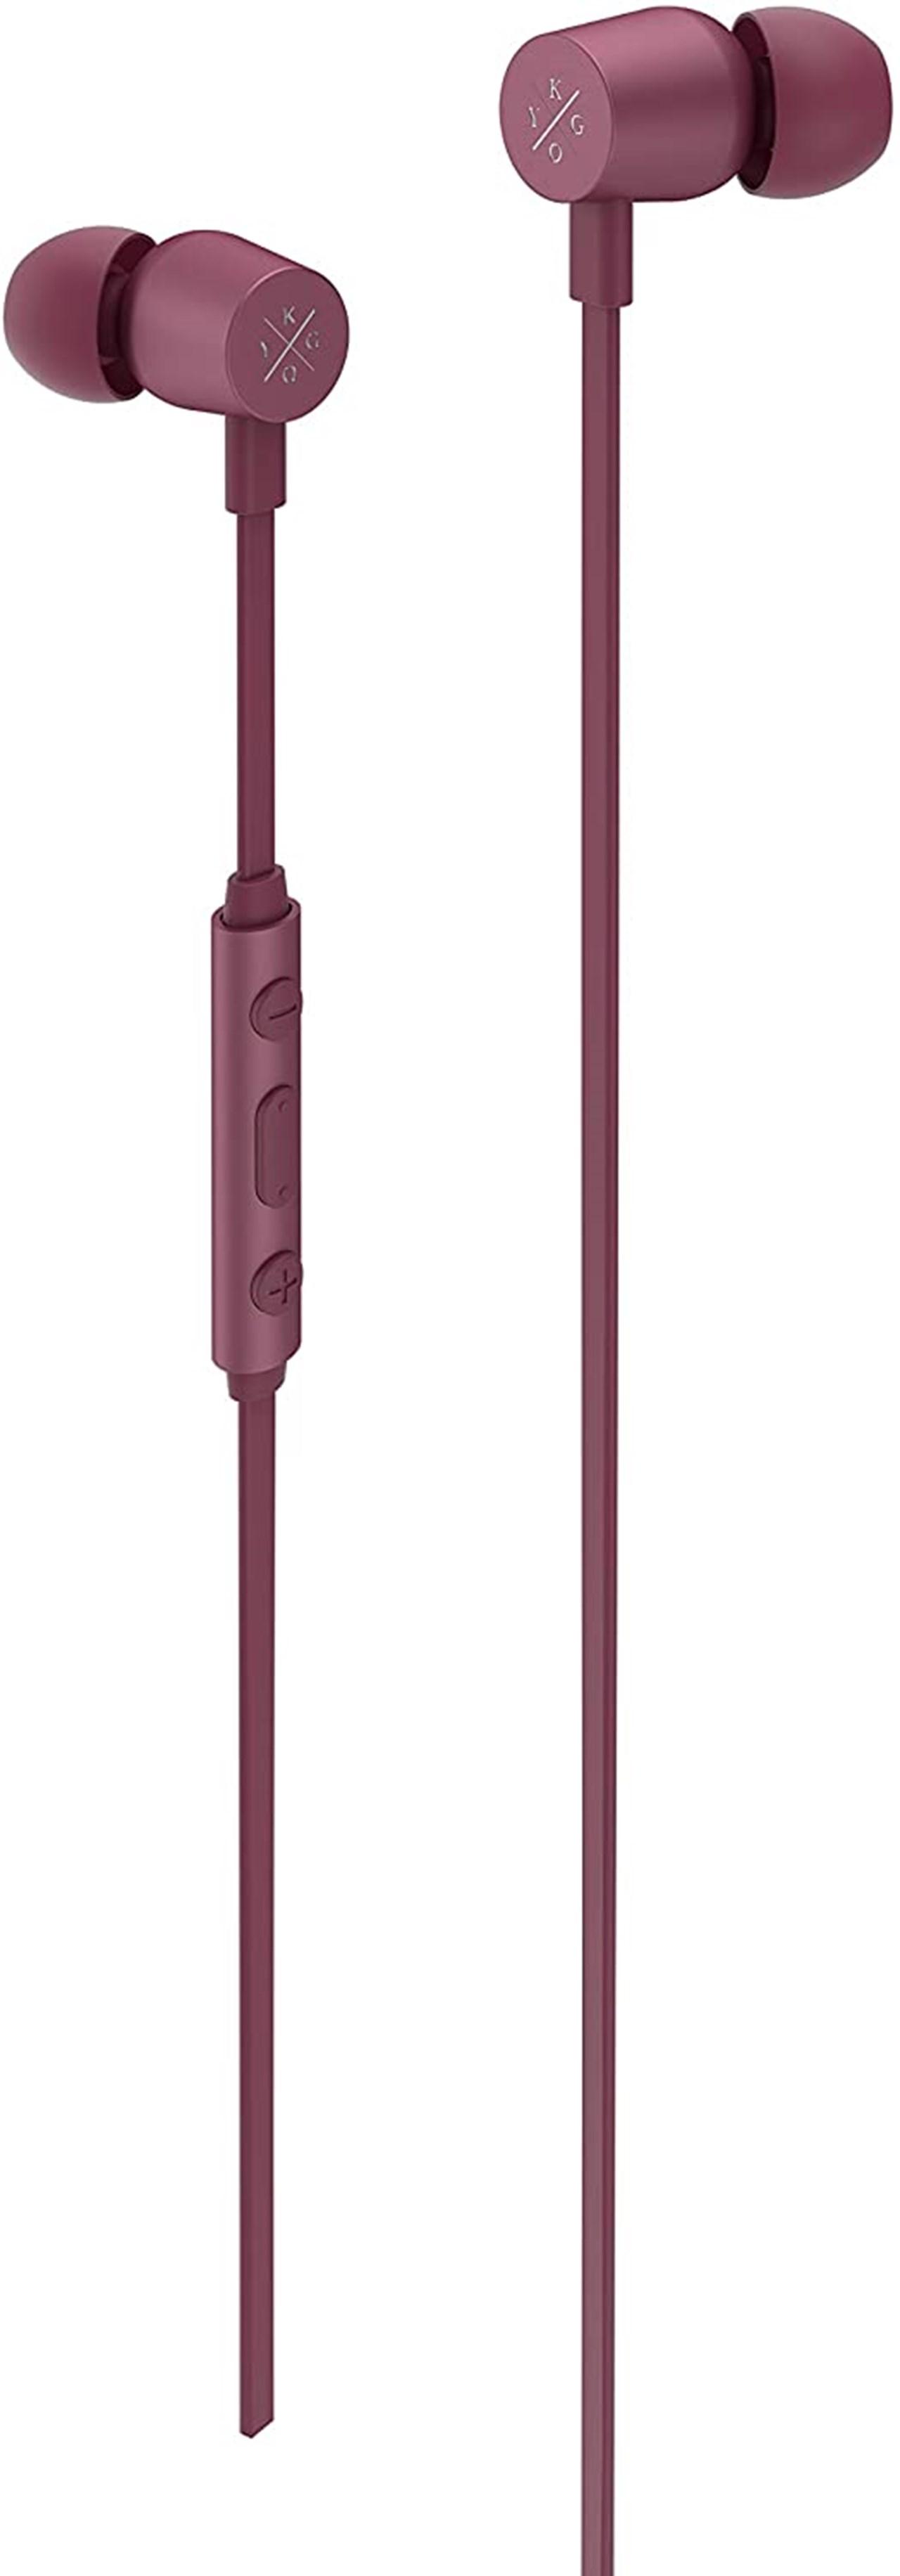 Kygo E2/400 Burgundy Earphones W/Mic - 1